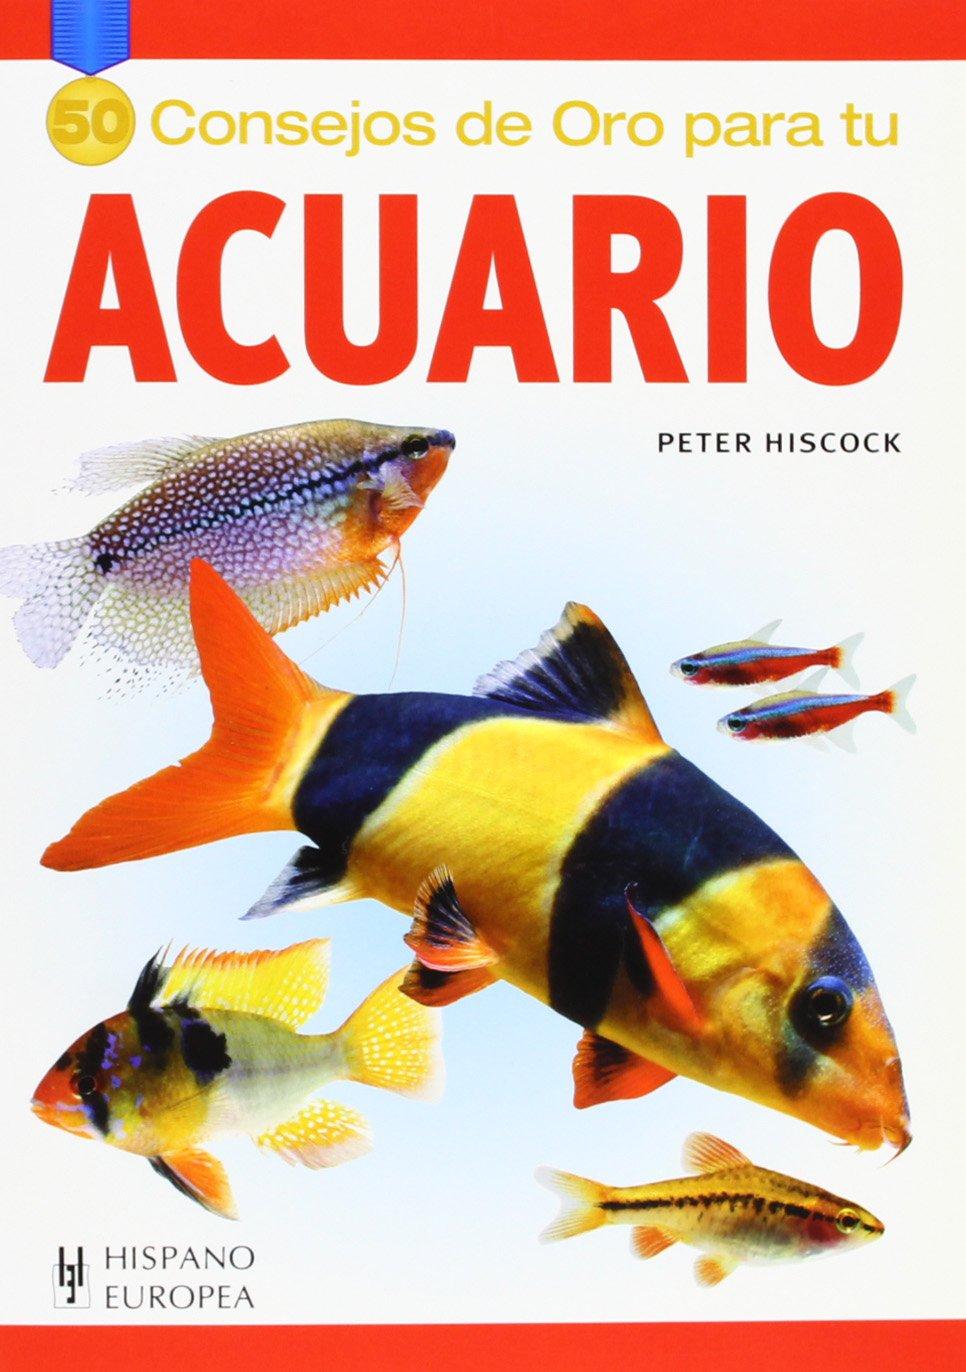 50 Consejos de oro para tu acuario (Spanish Edition) (Spanish) Paperback – June 17, 2008